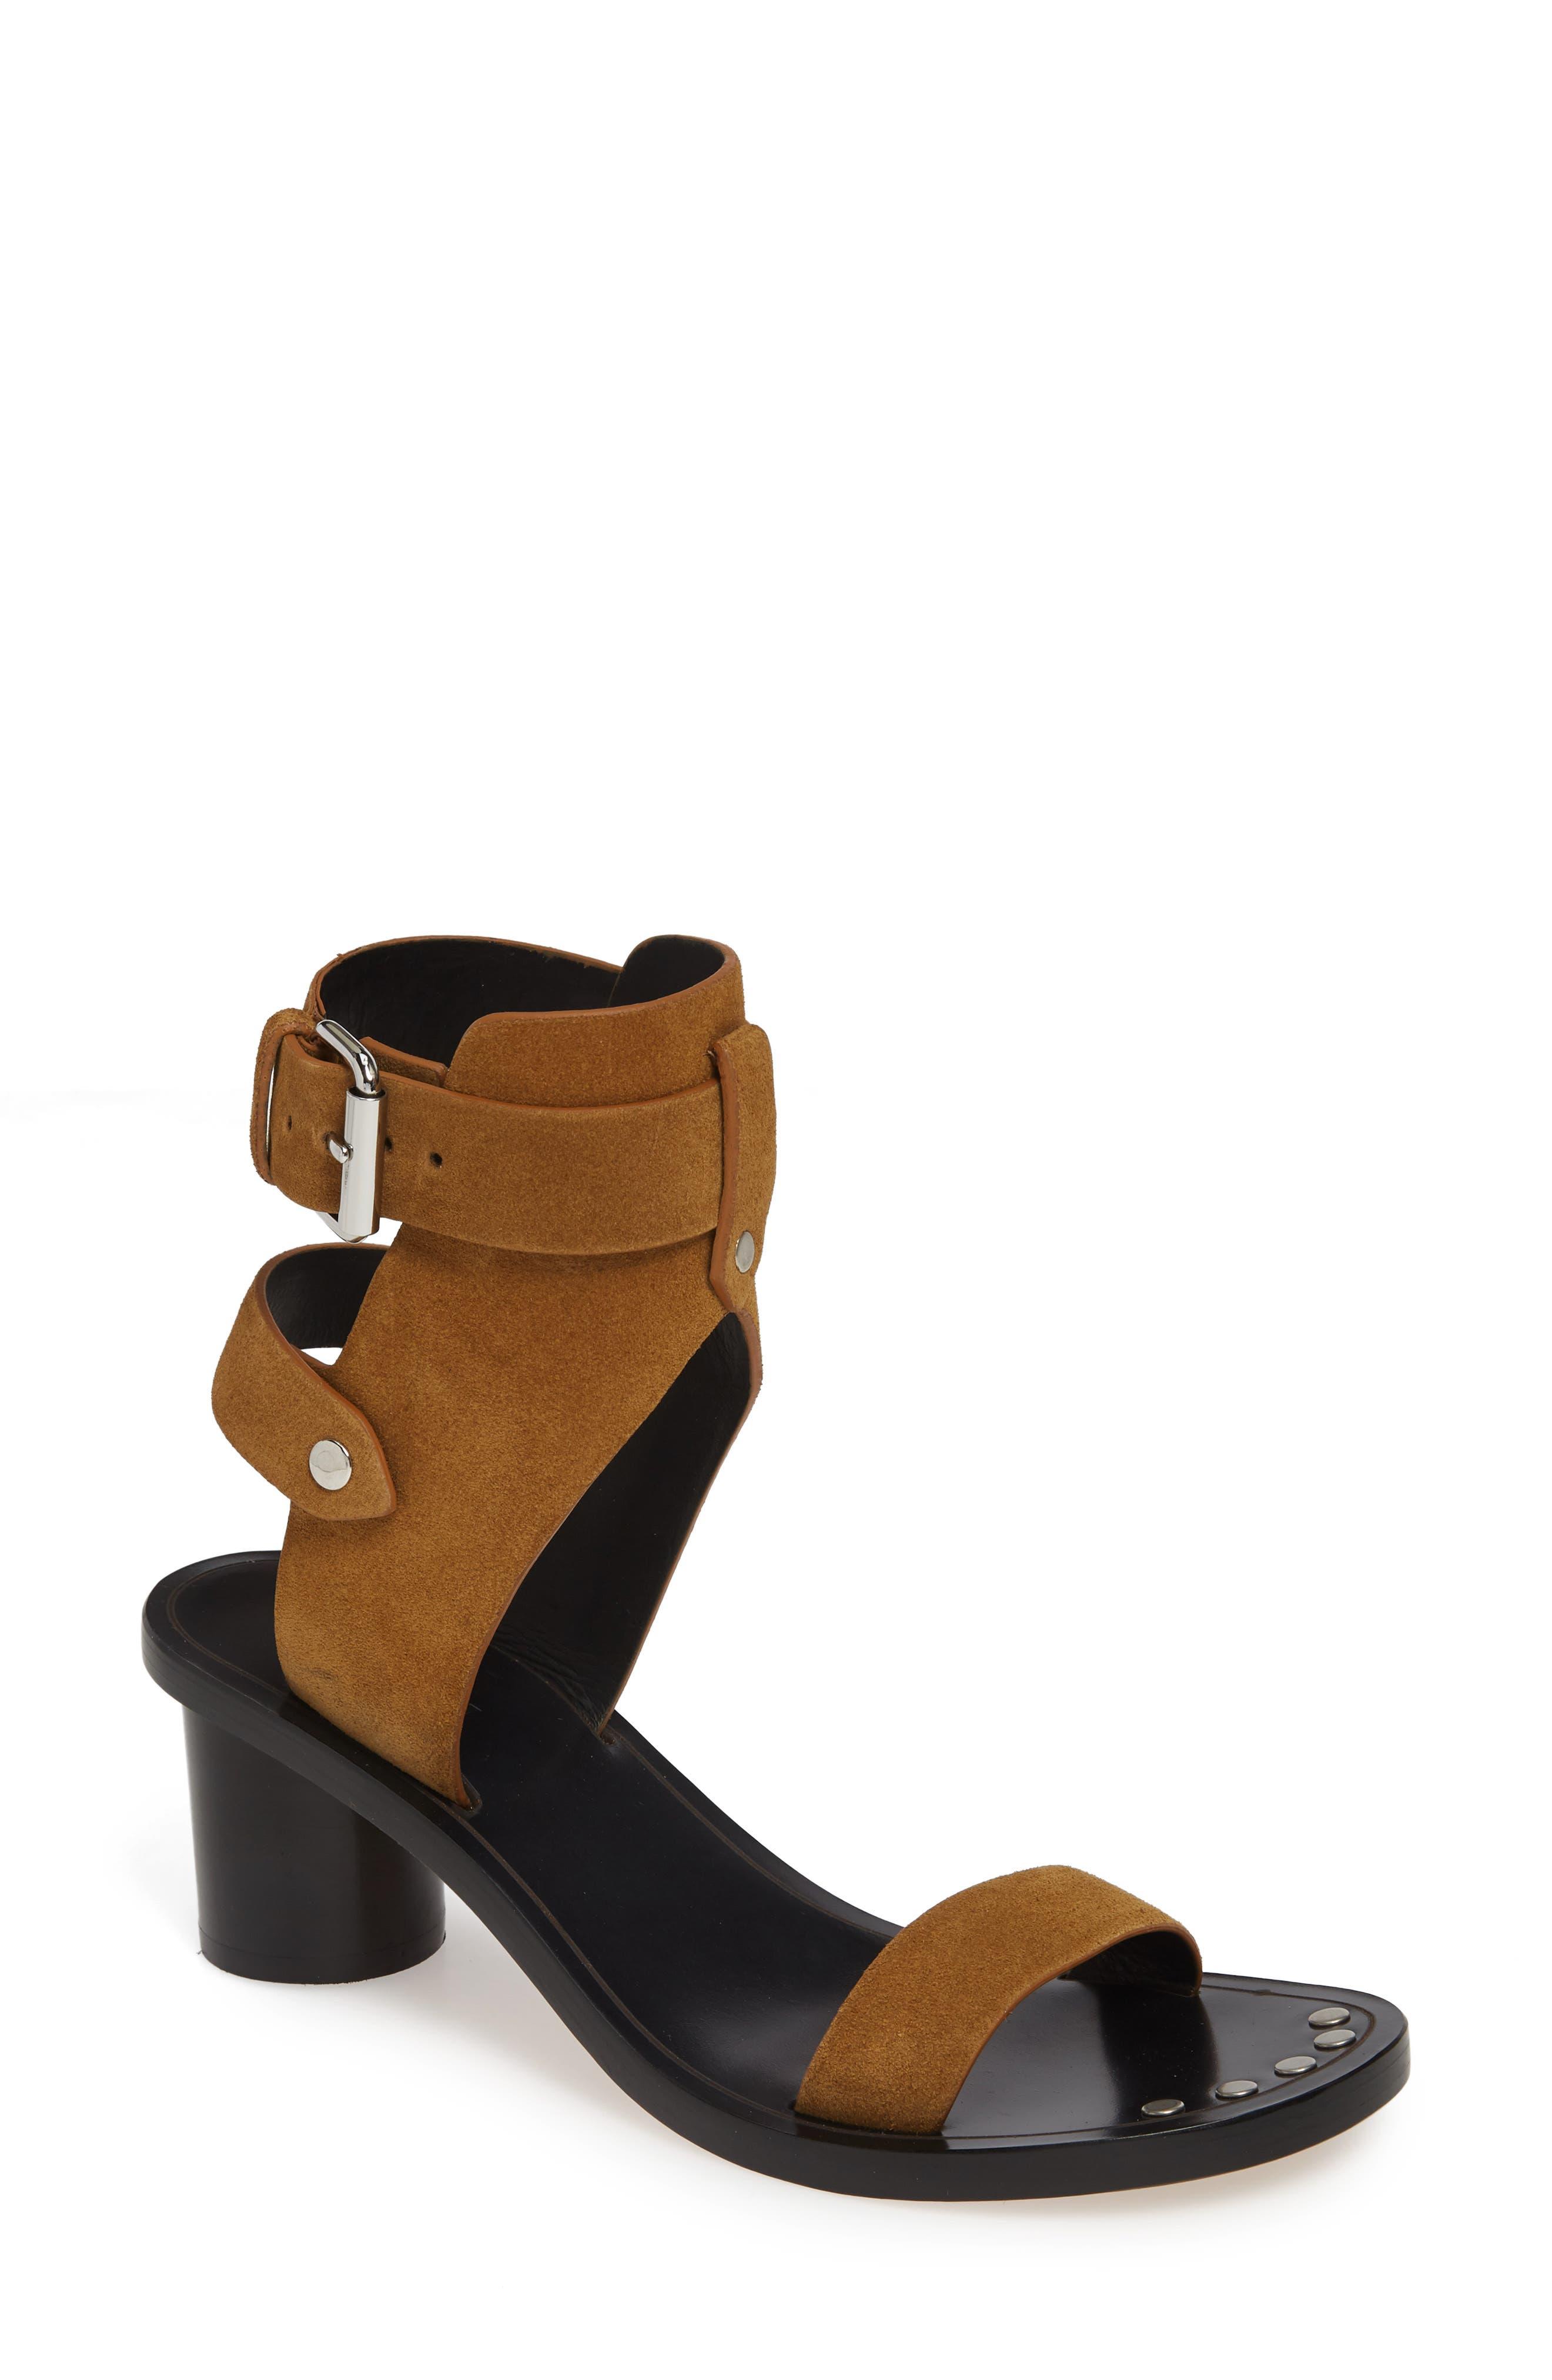 2ab26f714f6 ISABEL MARANT Designer Sandals for Women